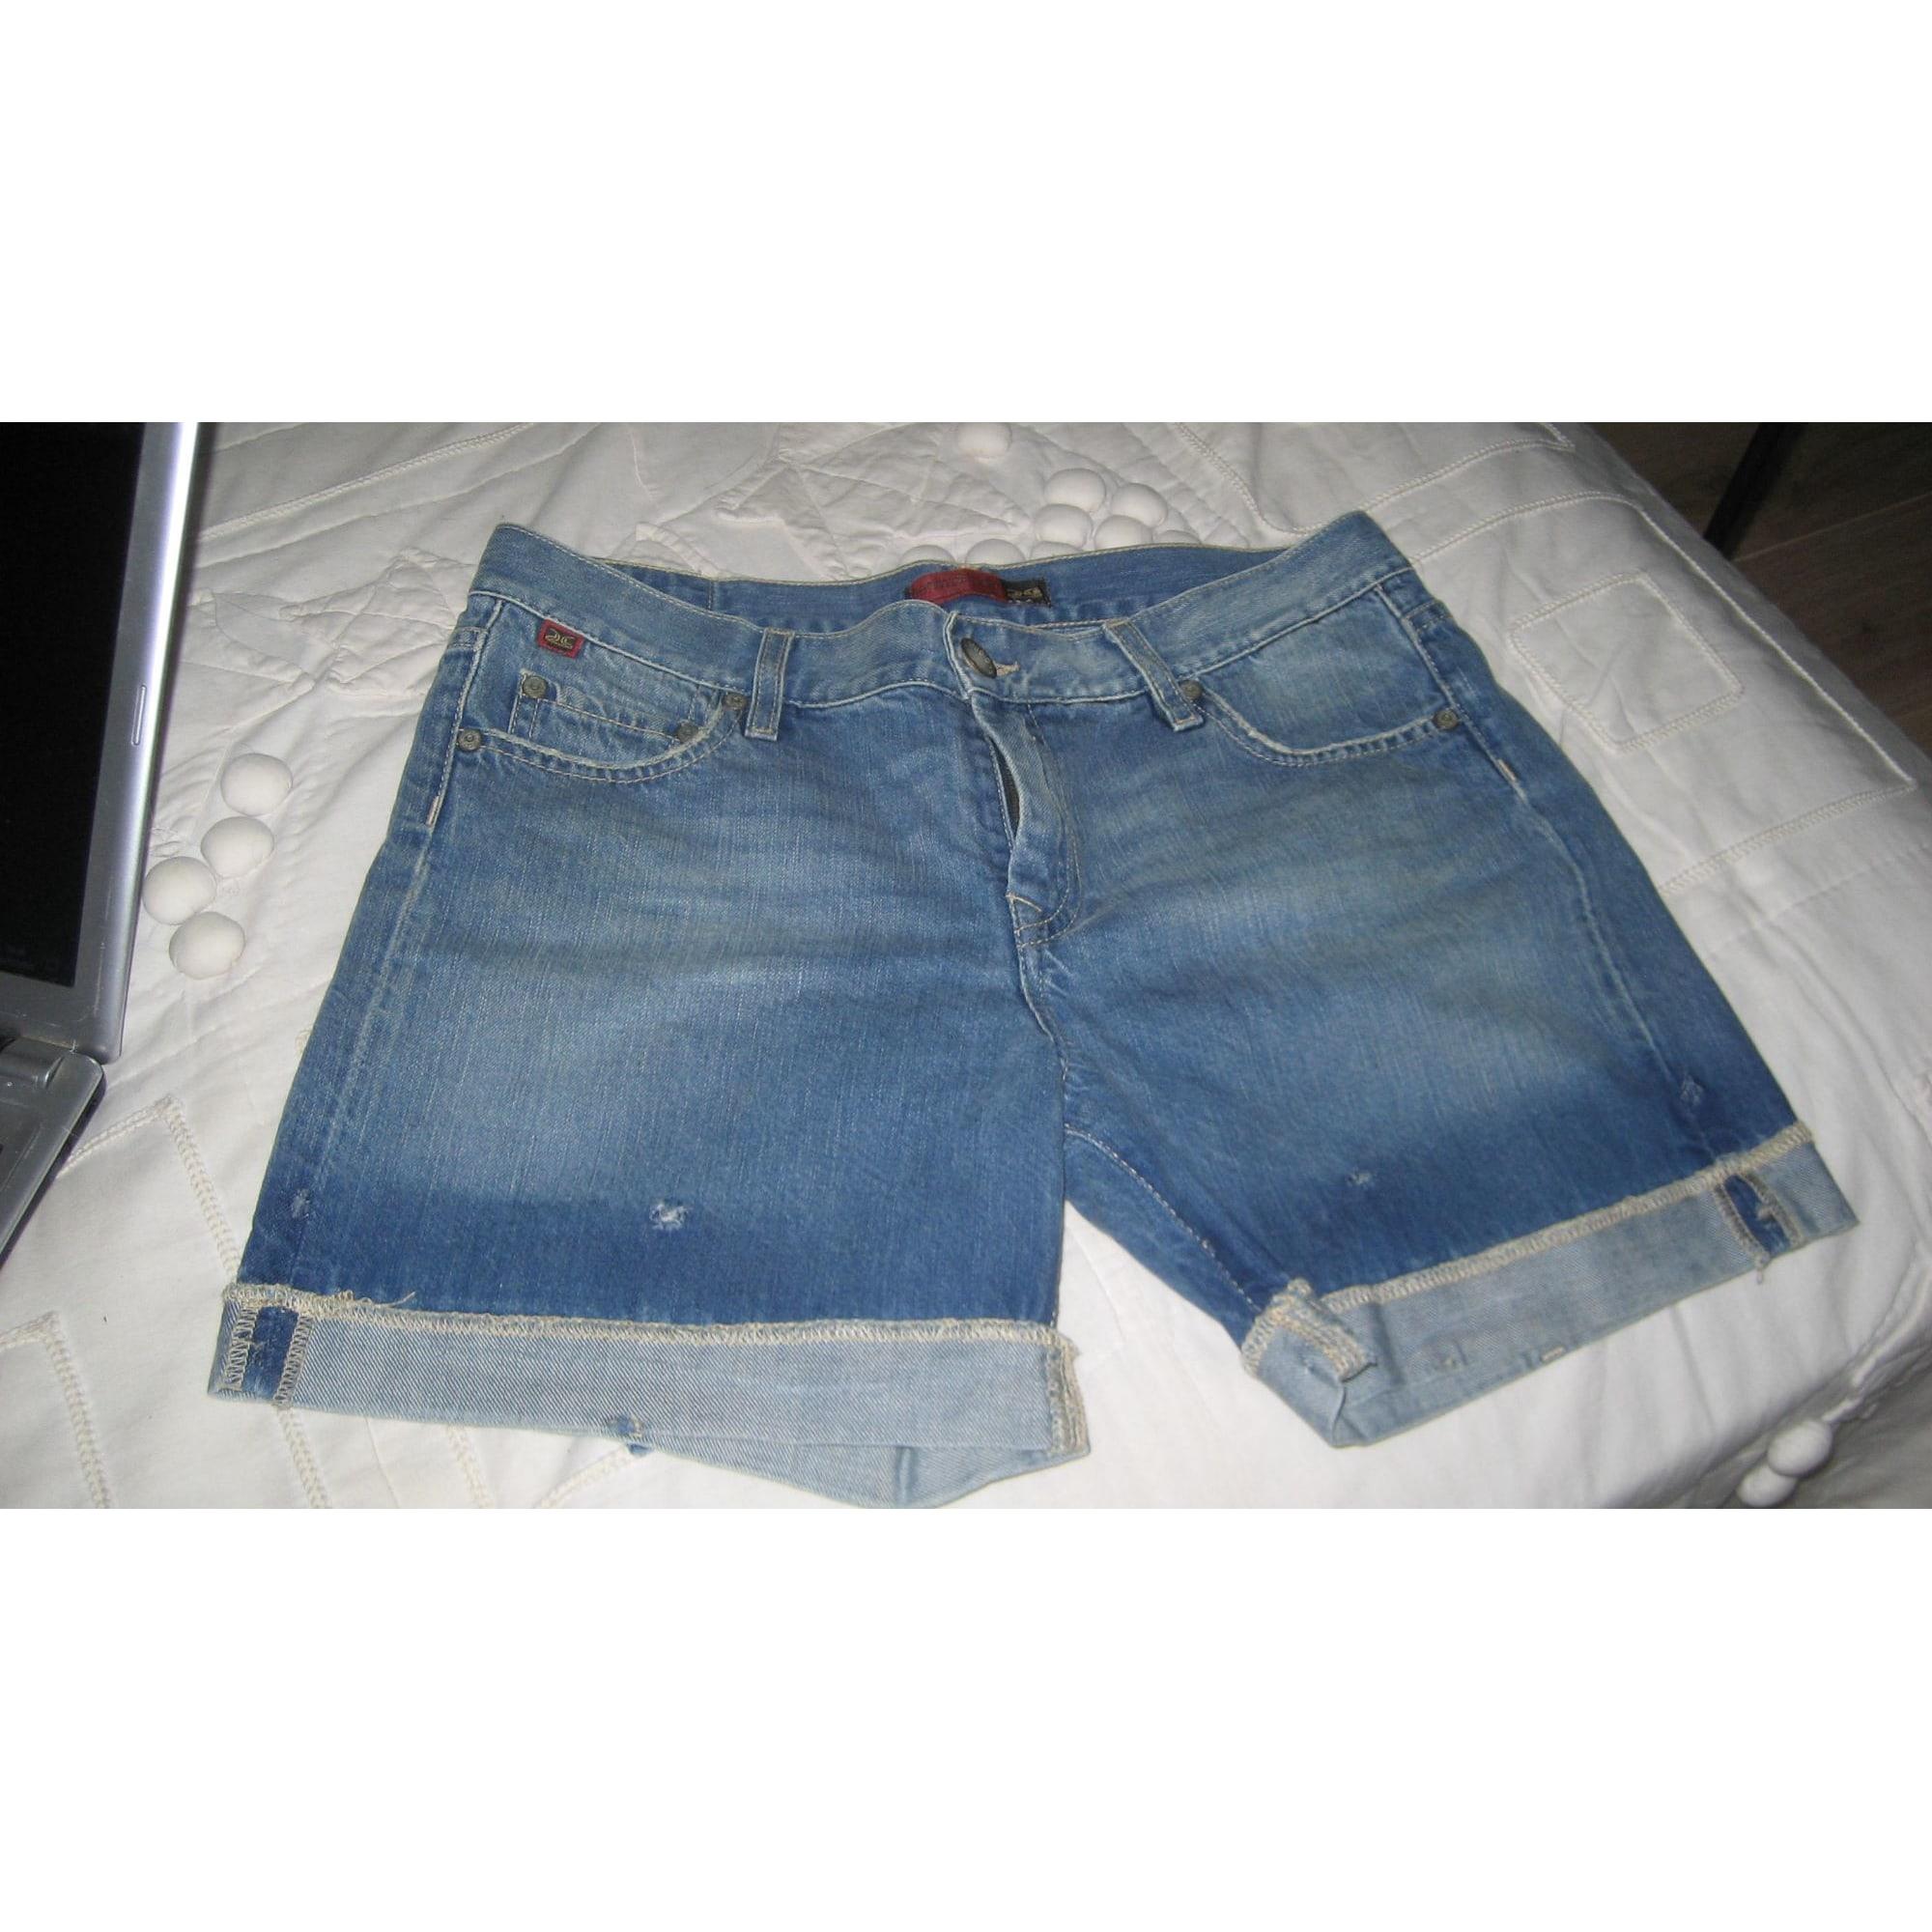 Short DENIM STUDIO jeans